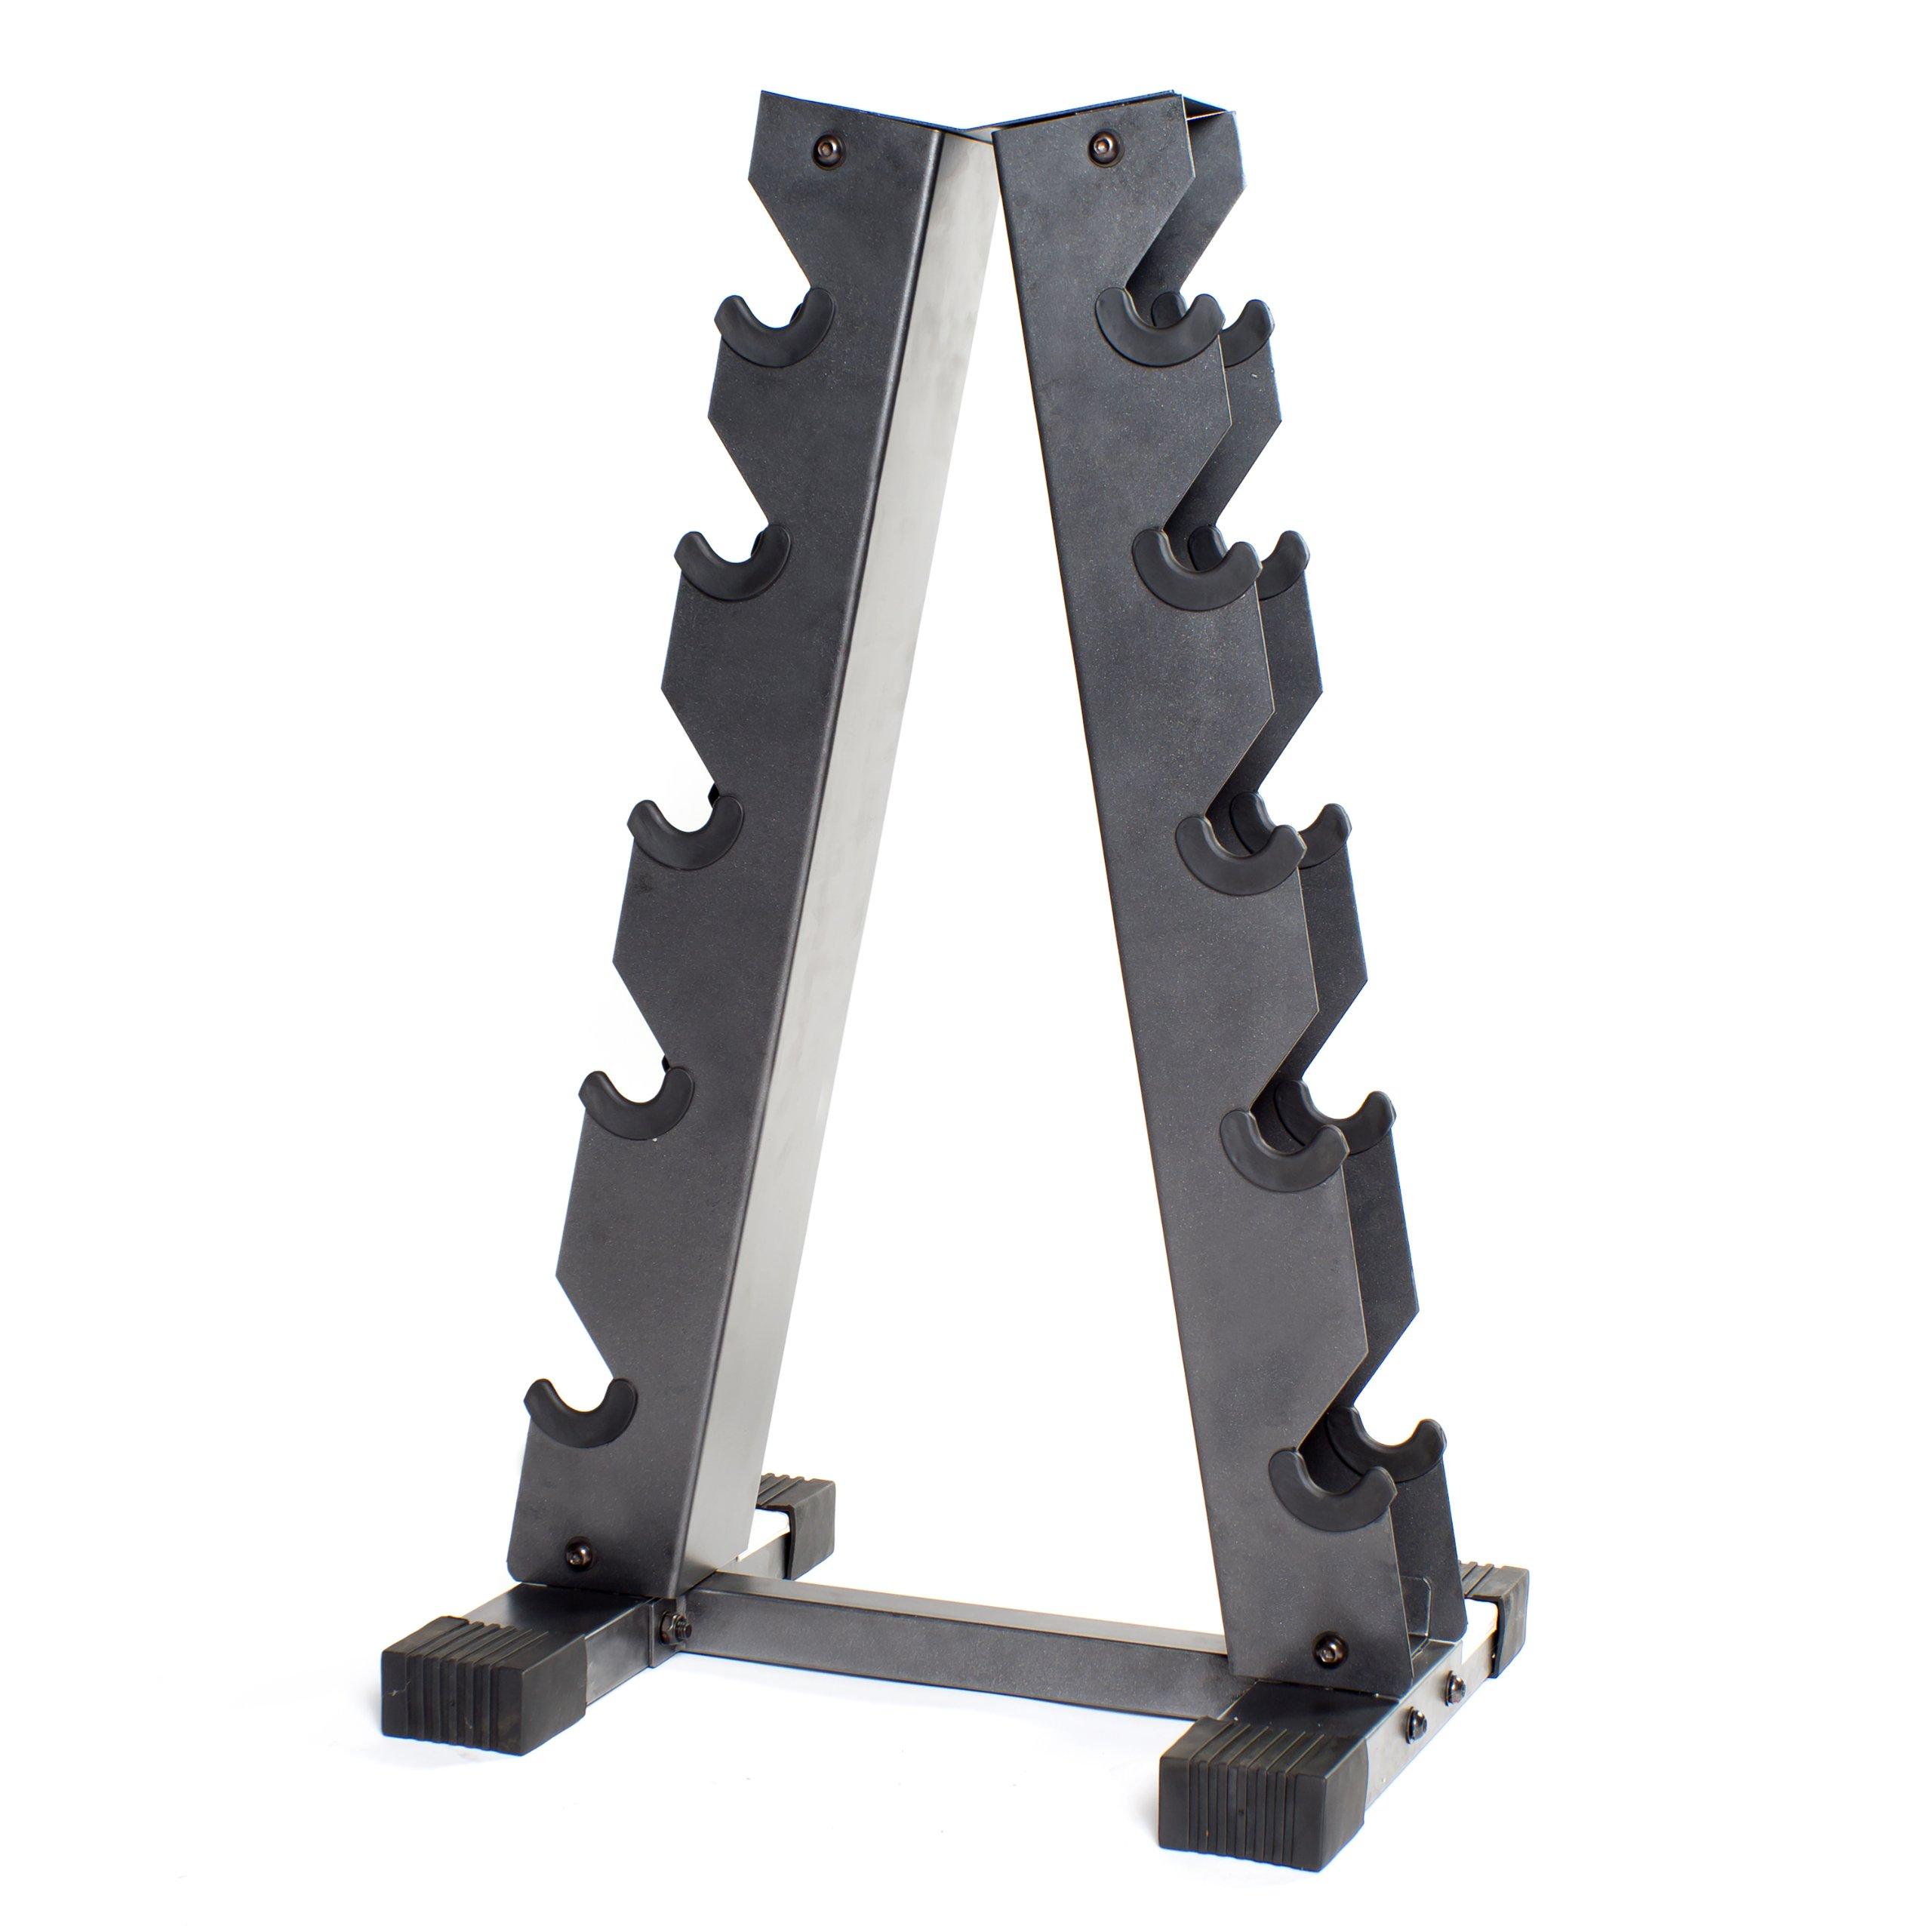 CAP Barbell A-Frame Dumbbell Rack, Gray by CAP Barbell